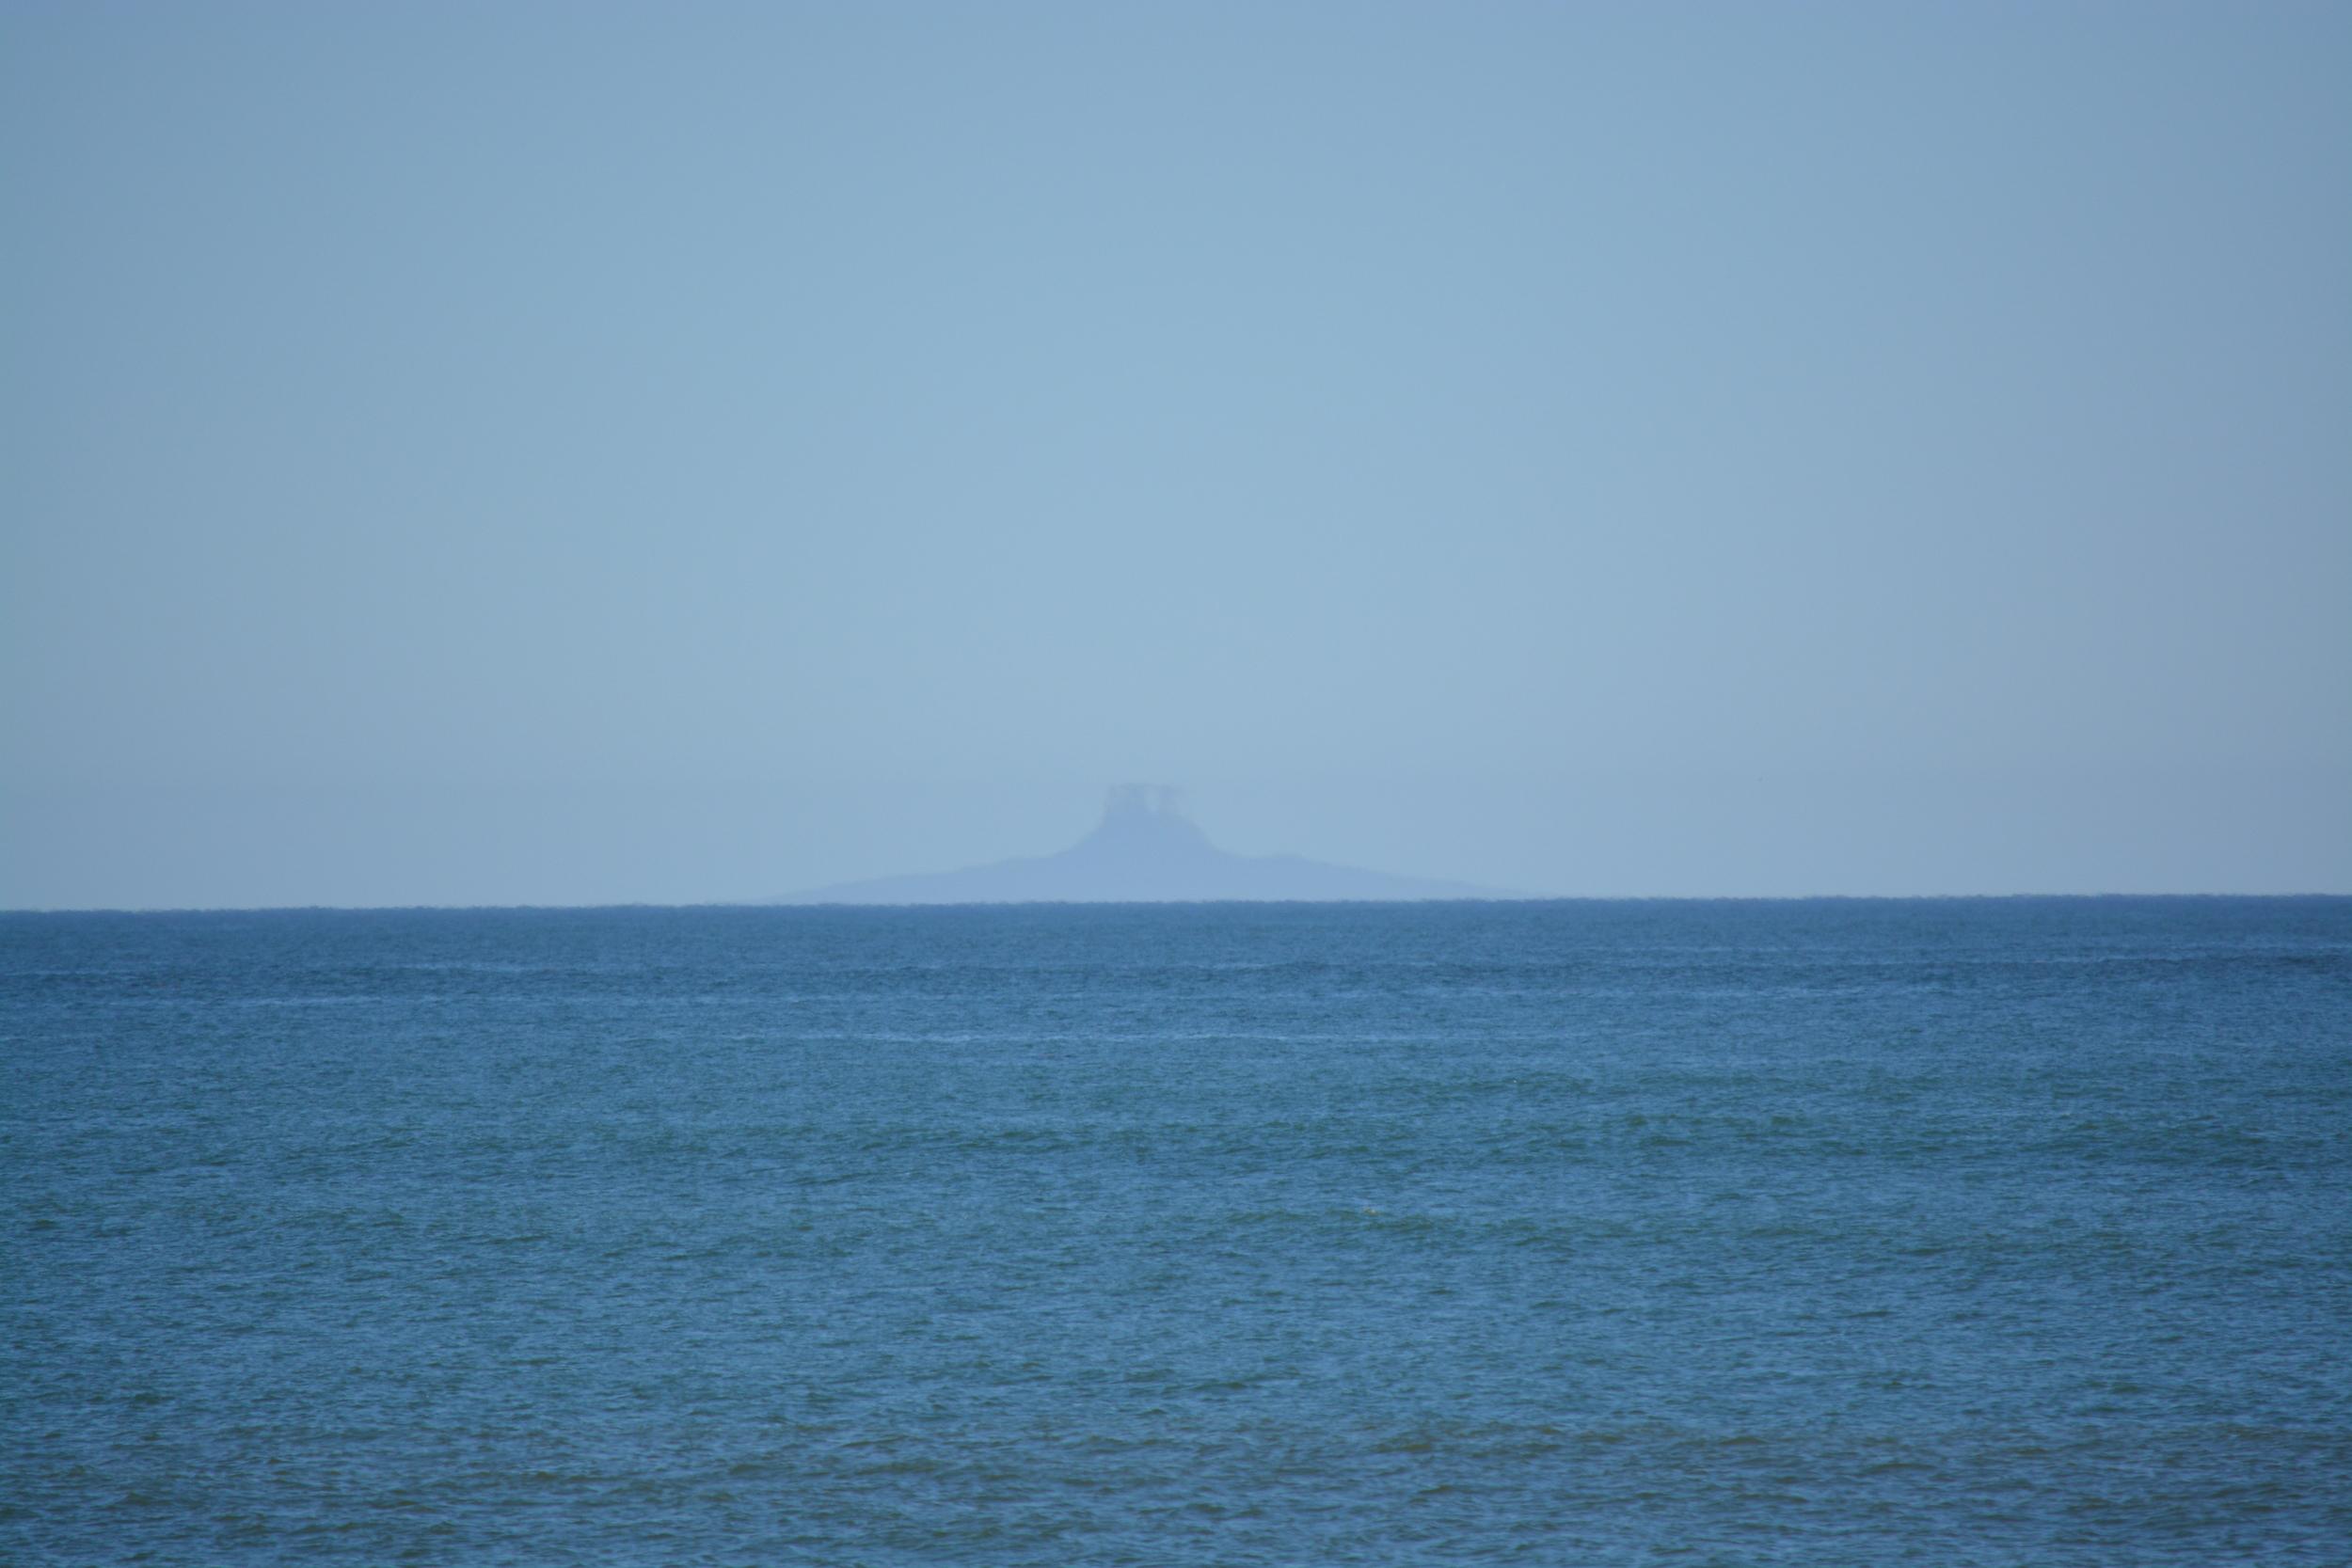 Baja California 10-5-13 Shipwrecks Surfing Adventure Ocean Experience Surf School San Diego (78).JPG